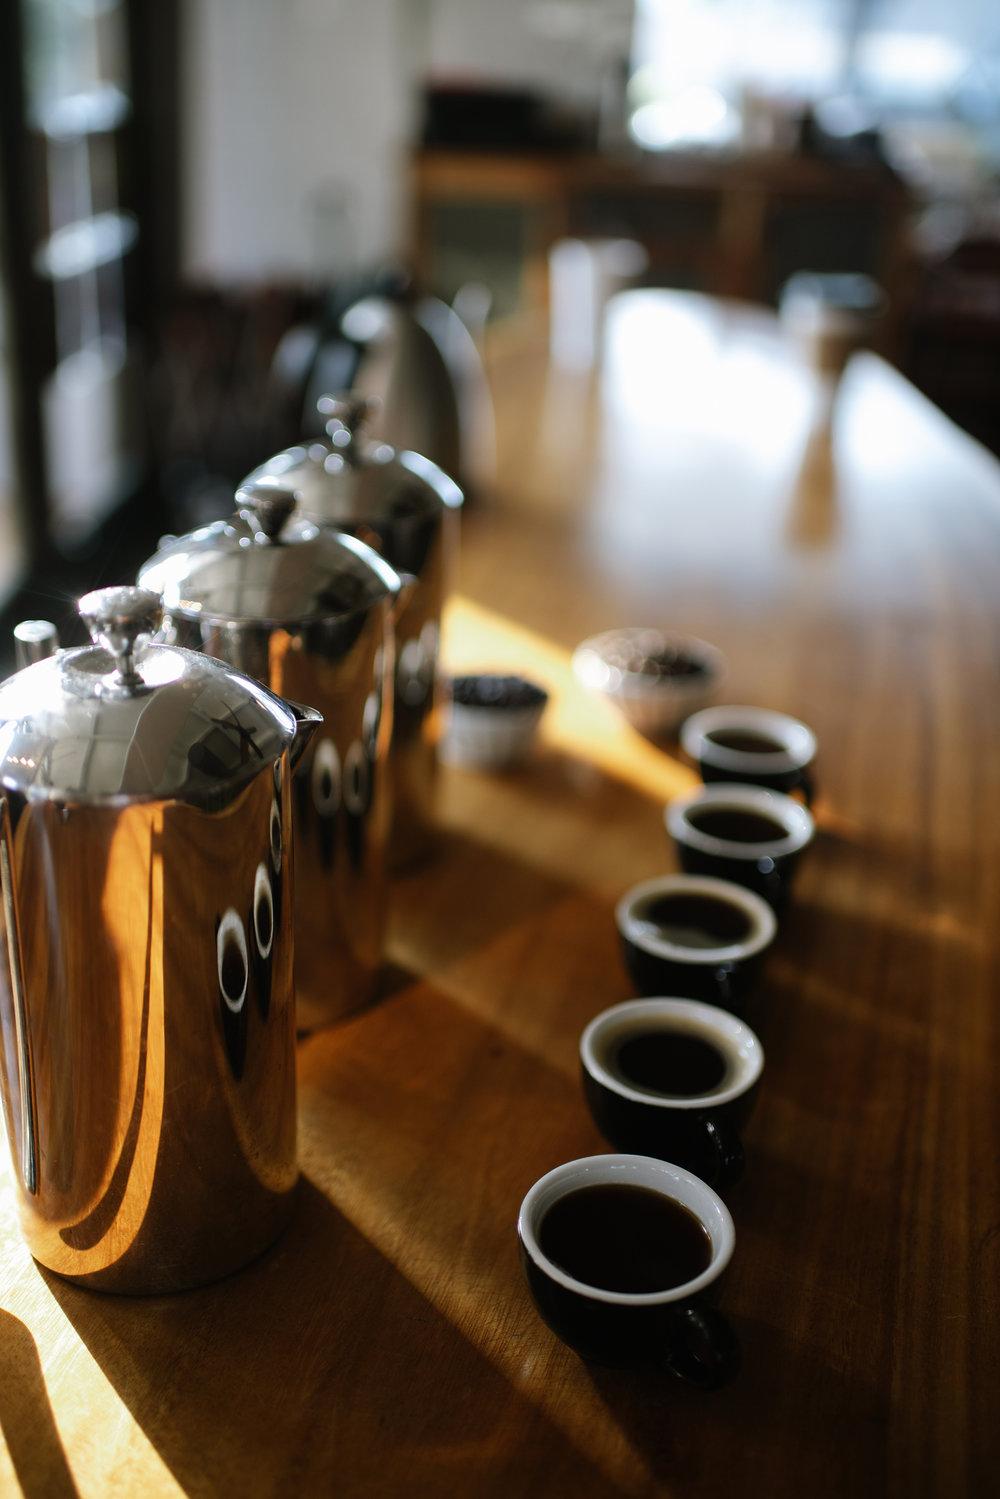 A tasting of 100% Kona coffee at our Kailua-Kona café. PHOTO: Blake Wisz